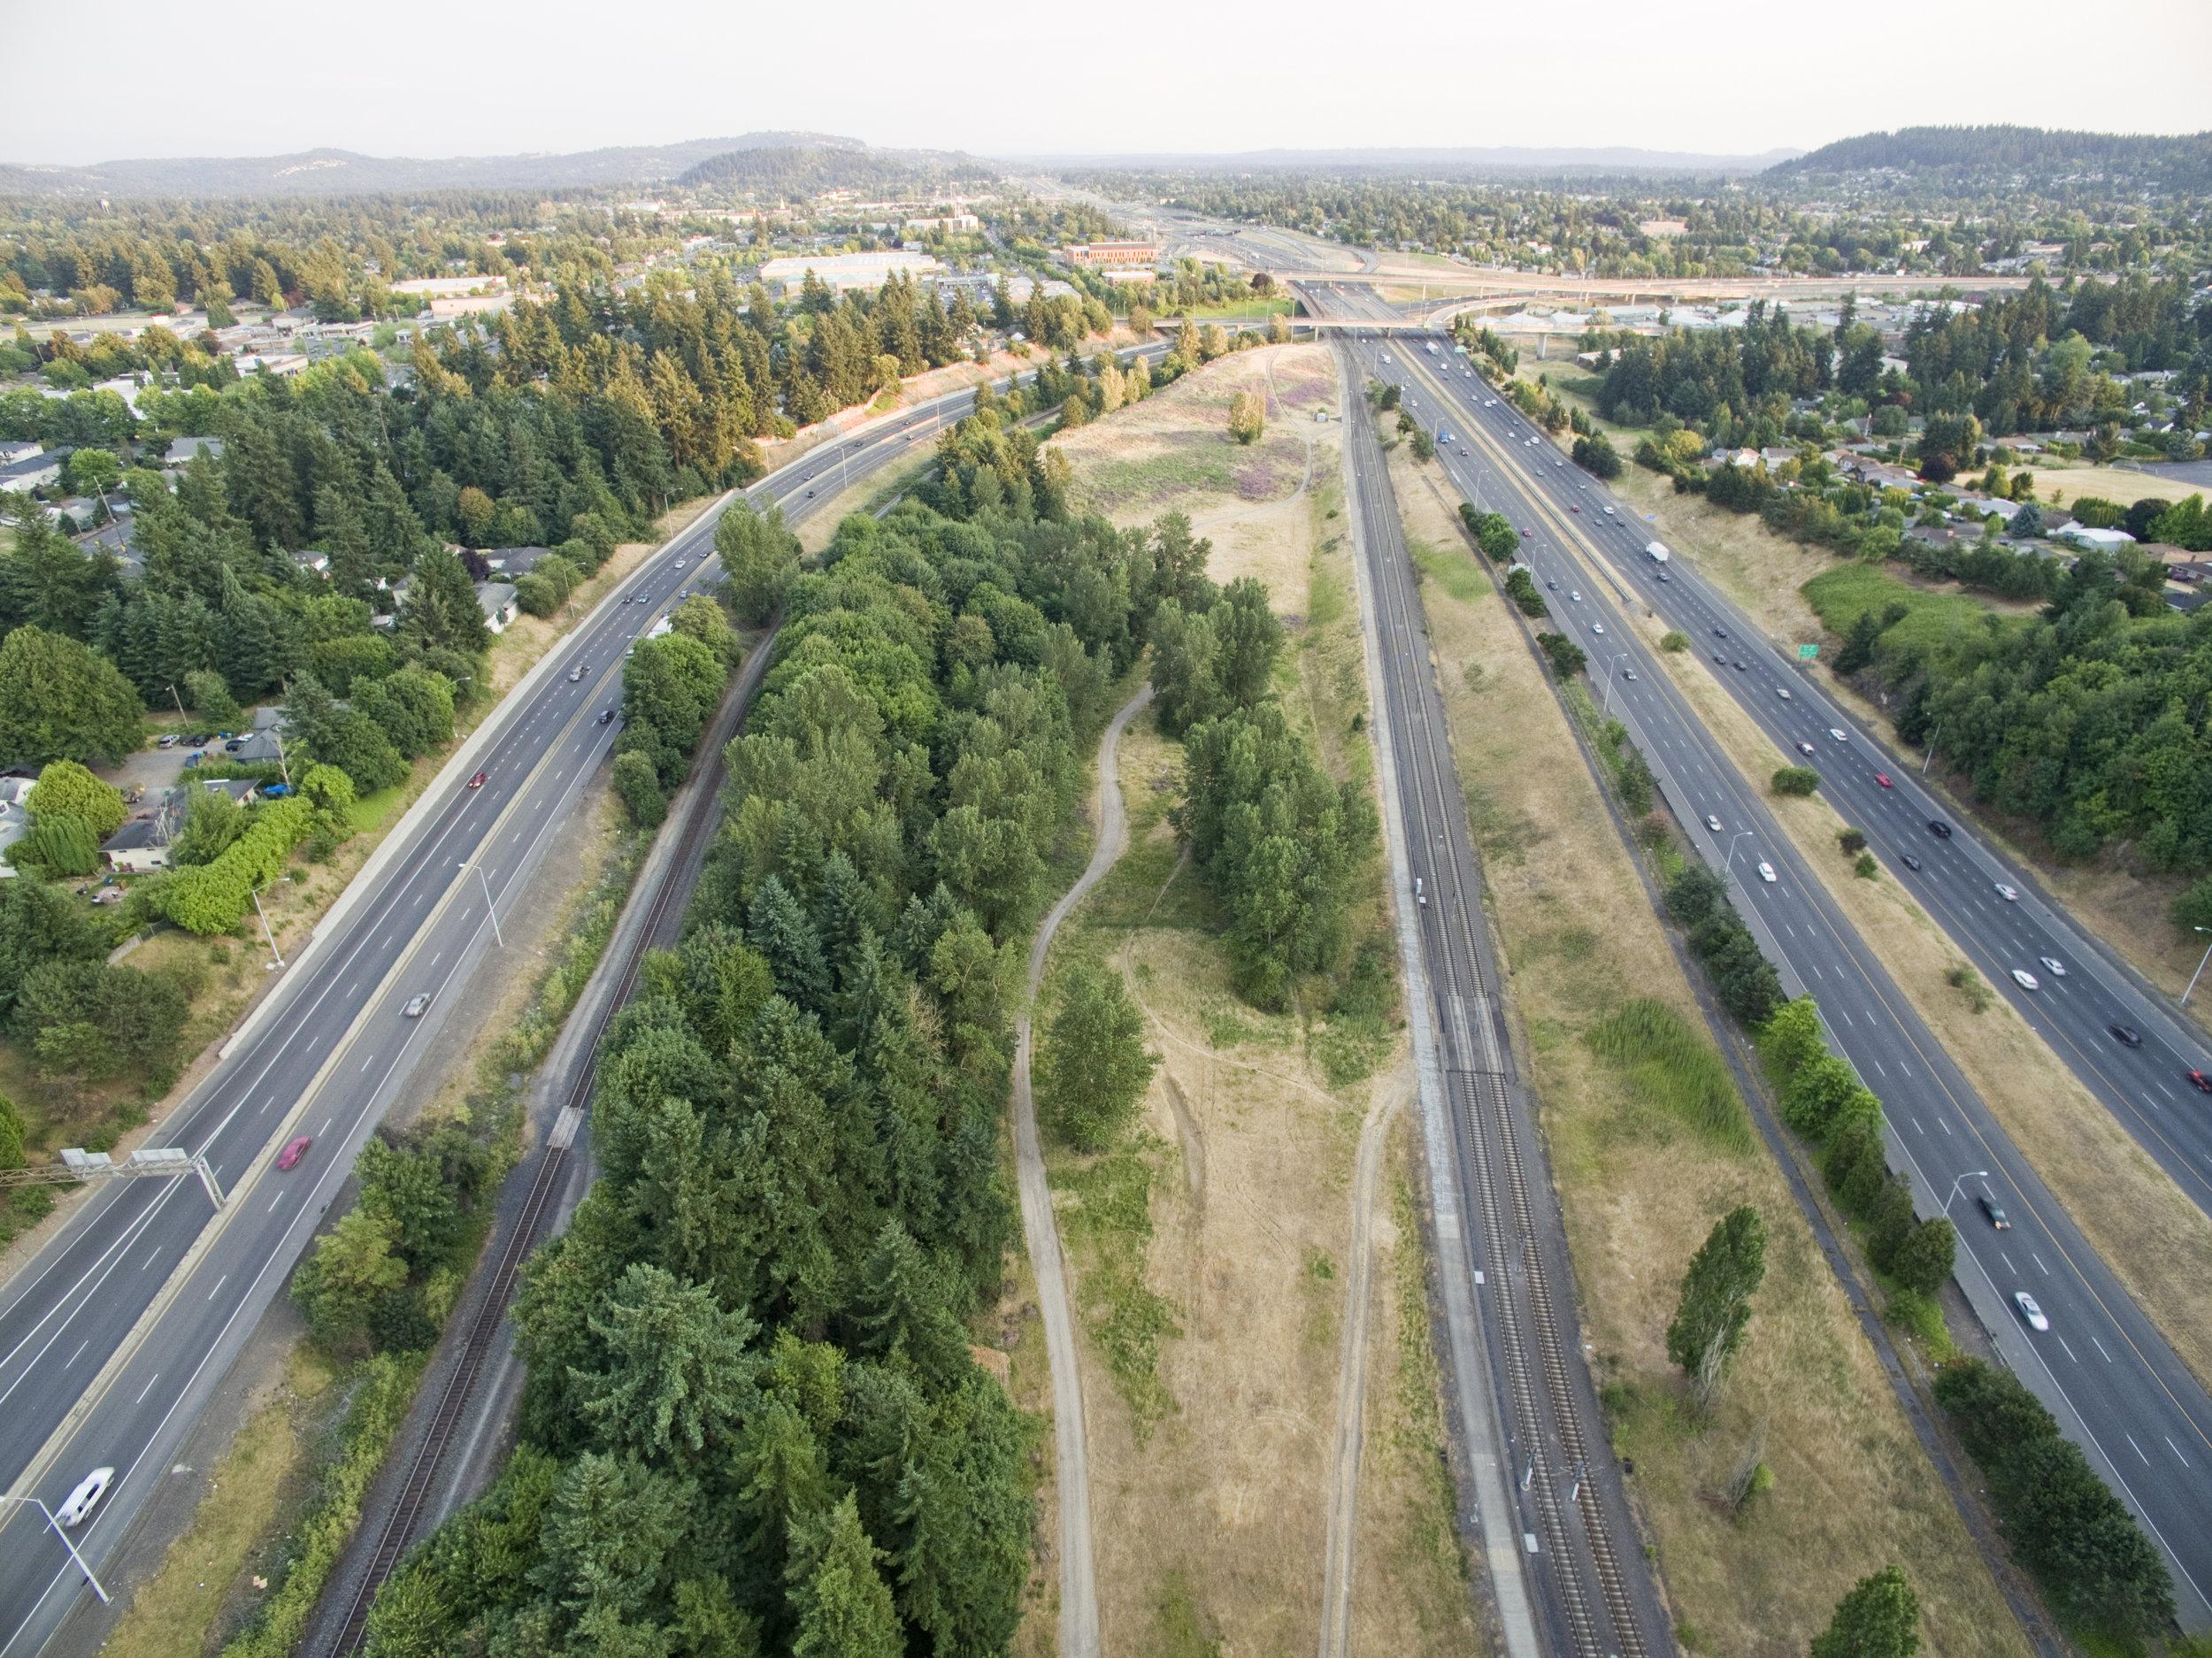 Gateway Green, multi-modal transportation and open spaces while enhancing habitat along Portland's I-205 corridor